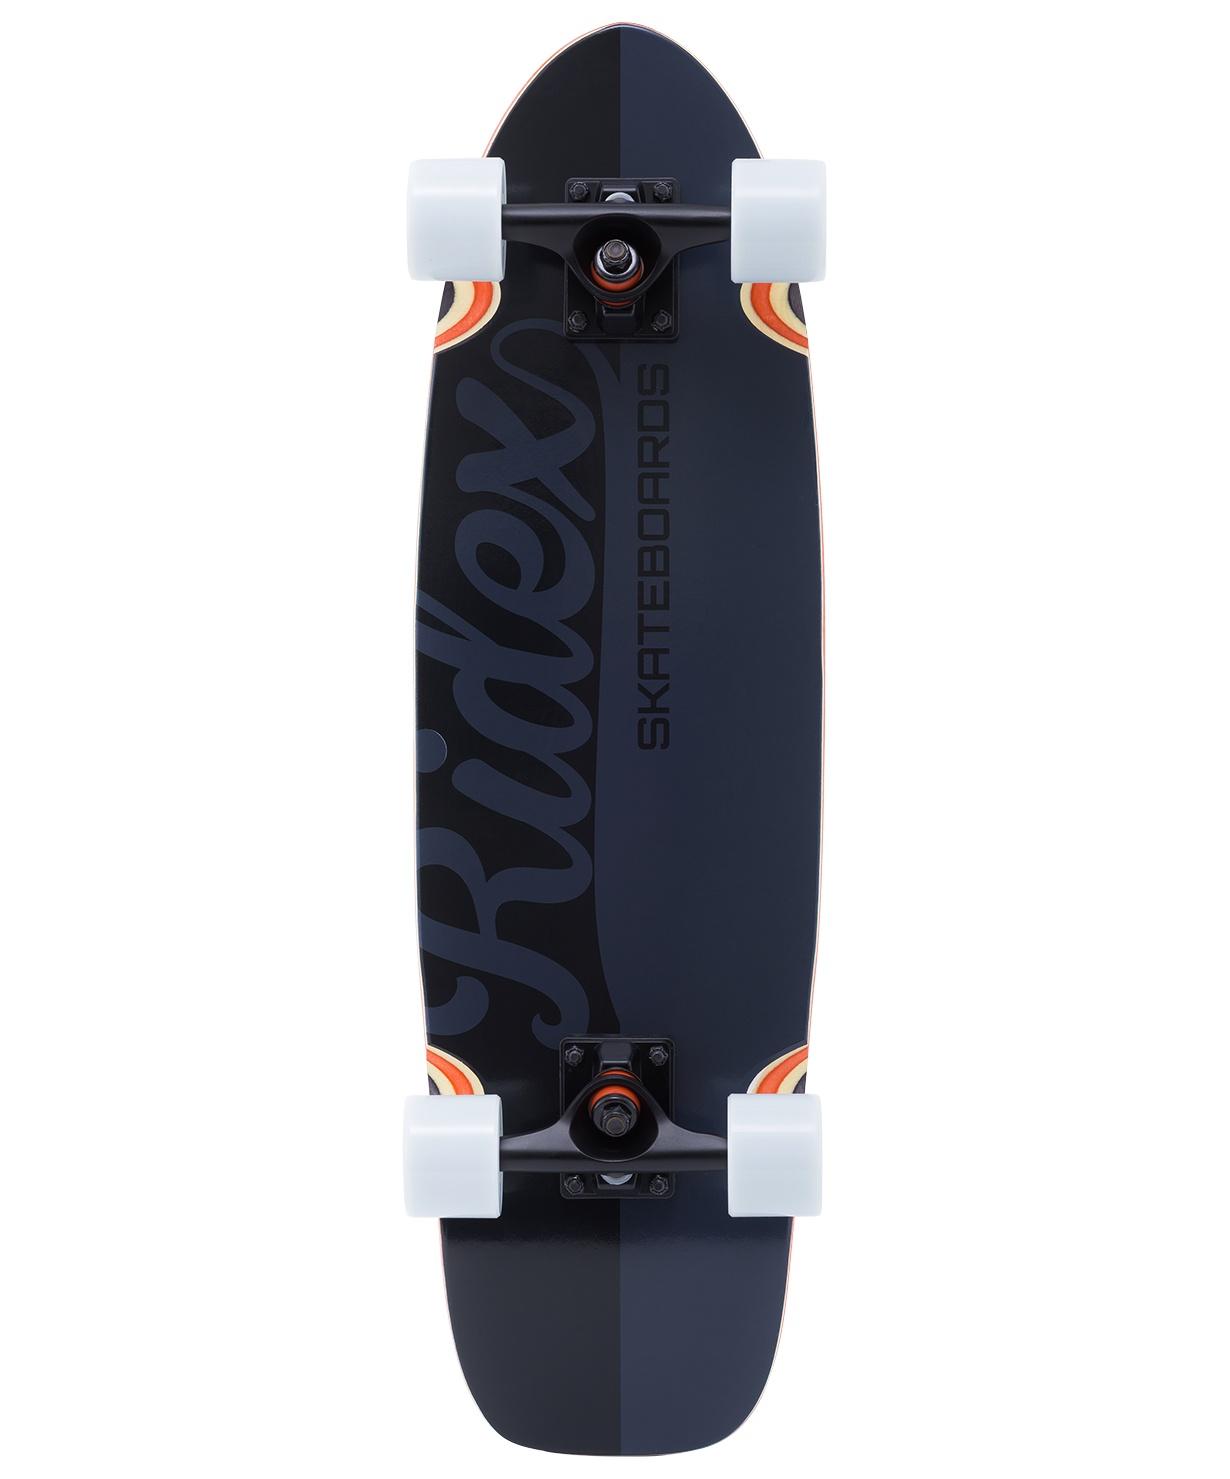 Круизер деревянный Ridex Darkside 28X8, ABEC-7